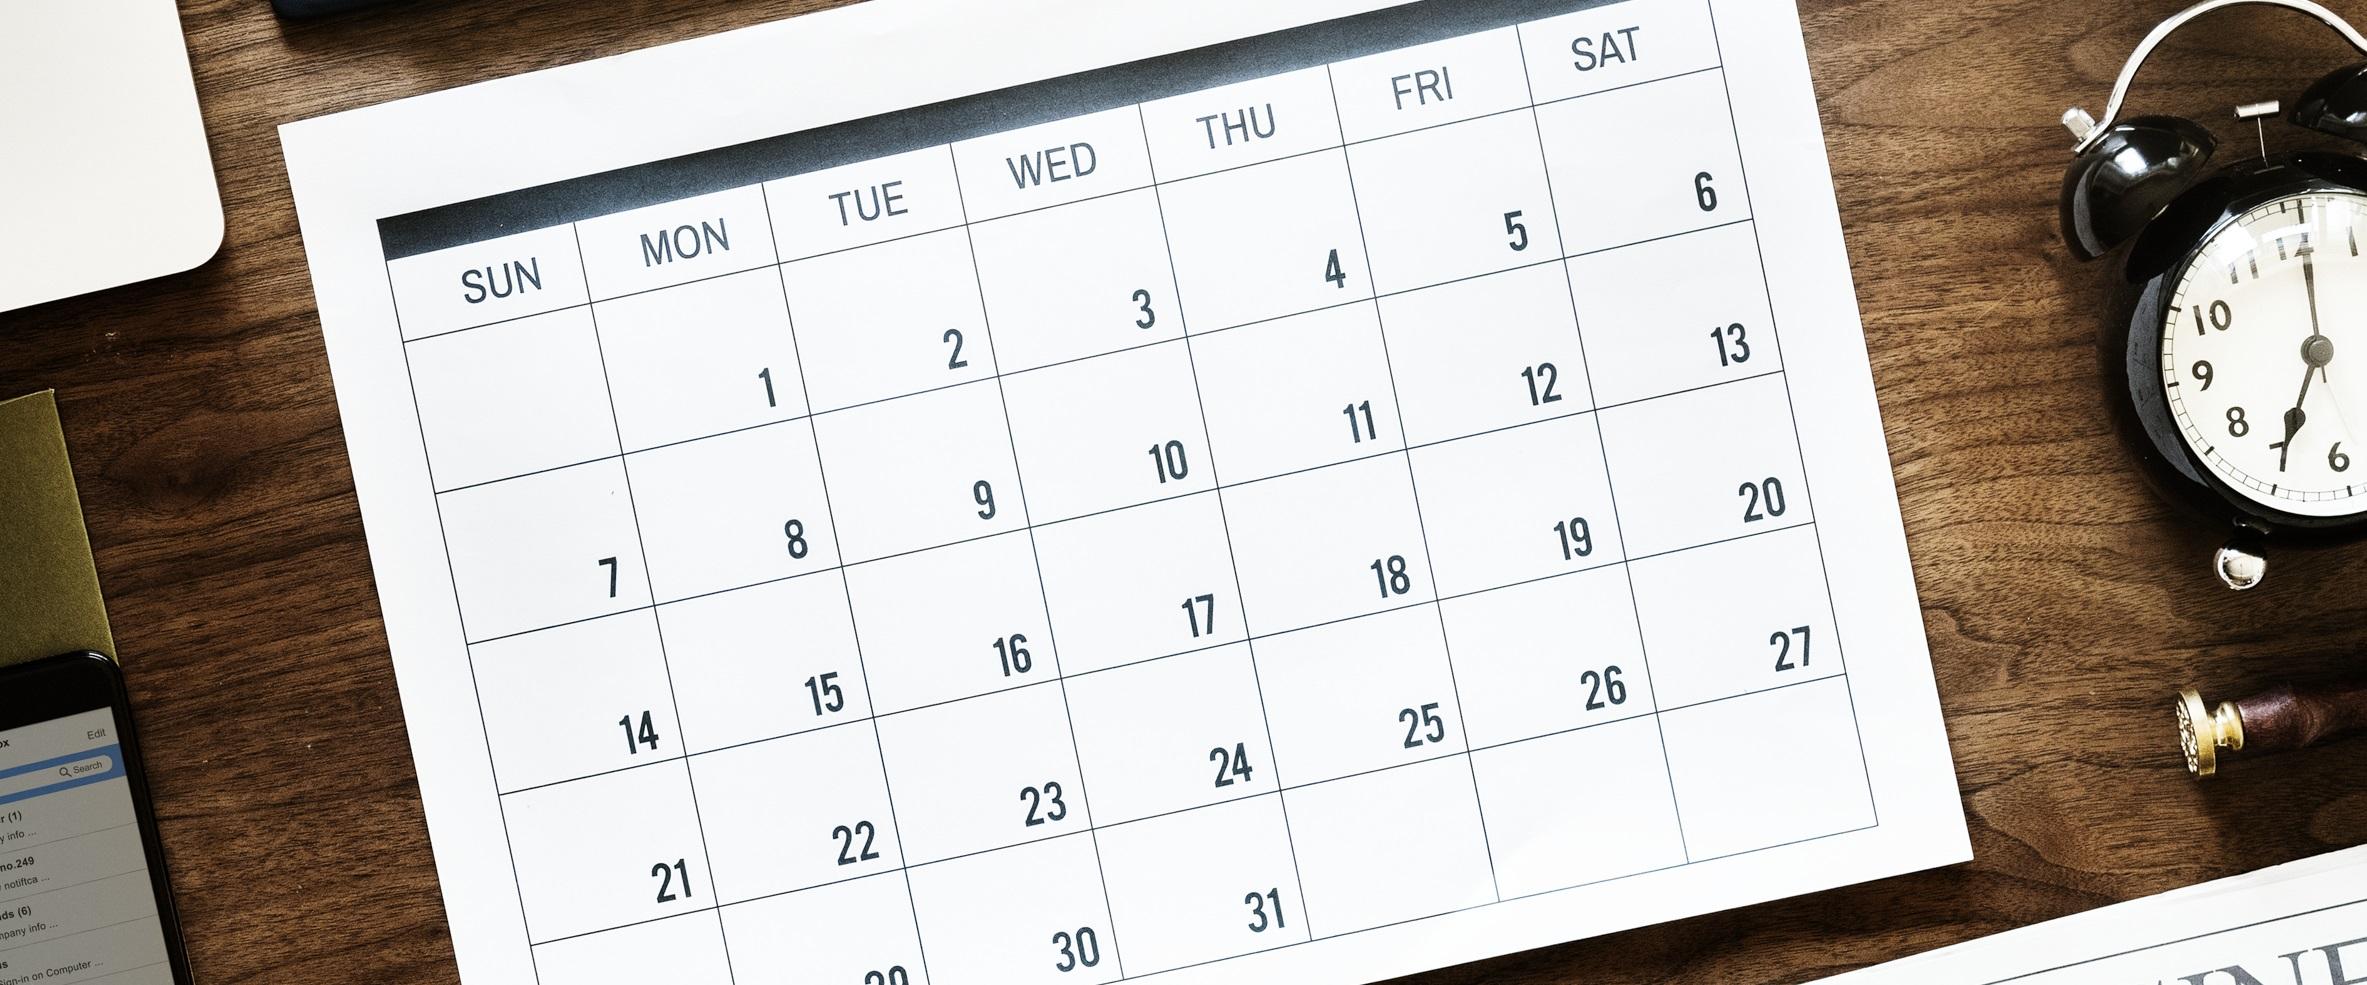 photo of an open calendar/agenda